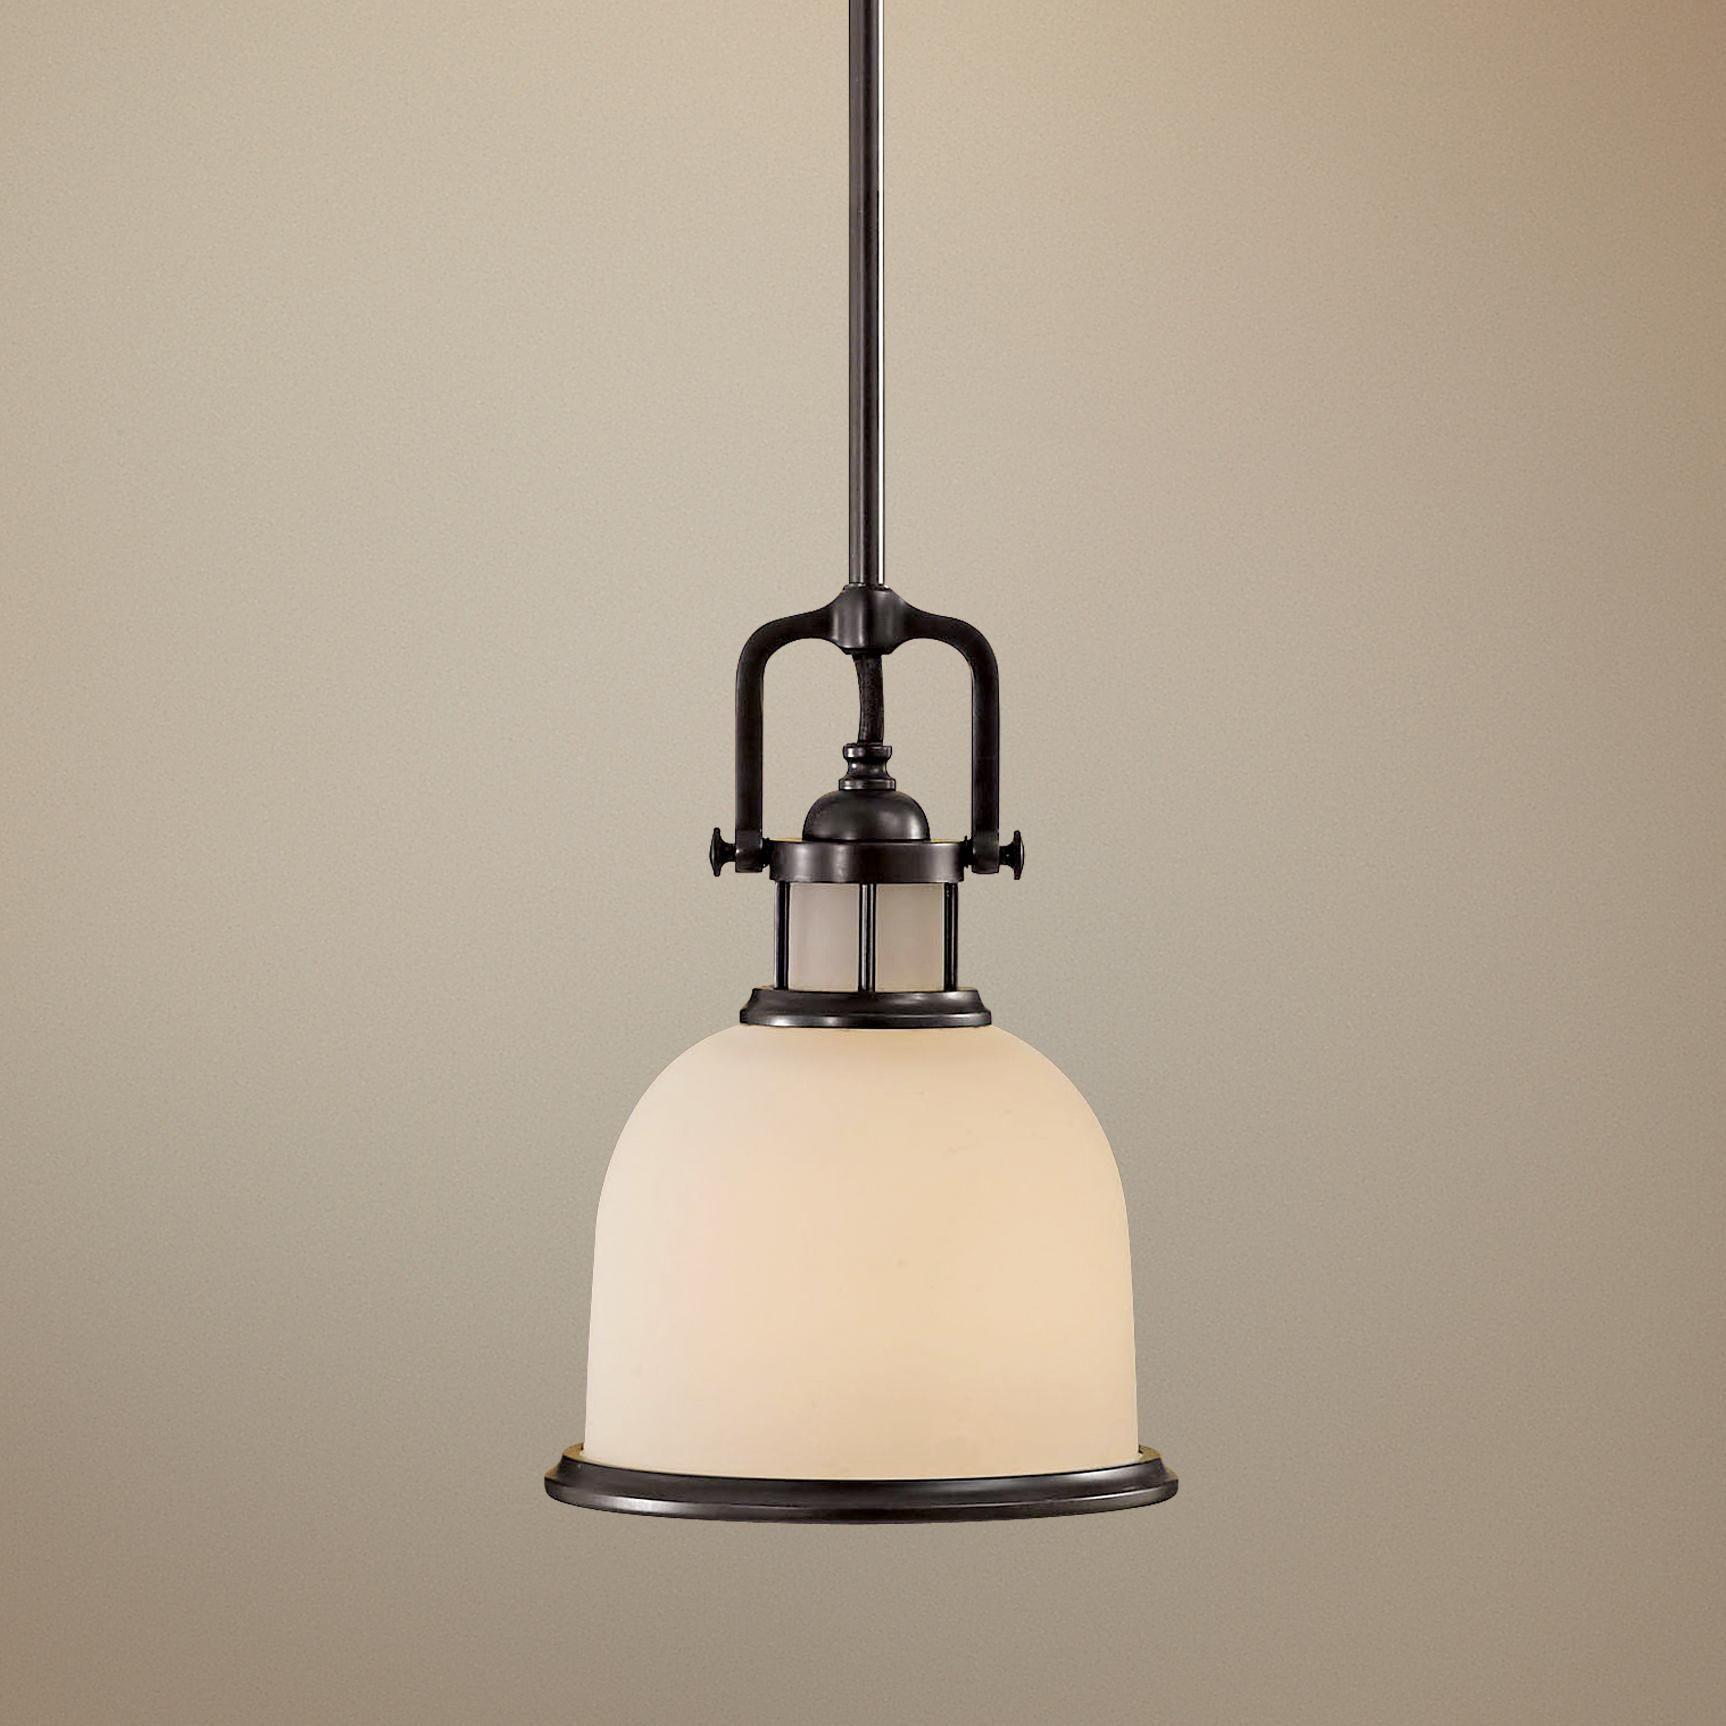 "Feiss Parker Place Dark Bronze 8"" Wide Mini Pendant Light"